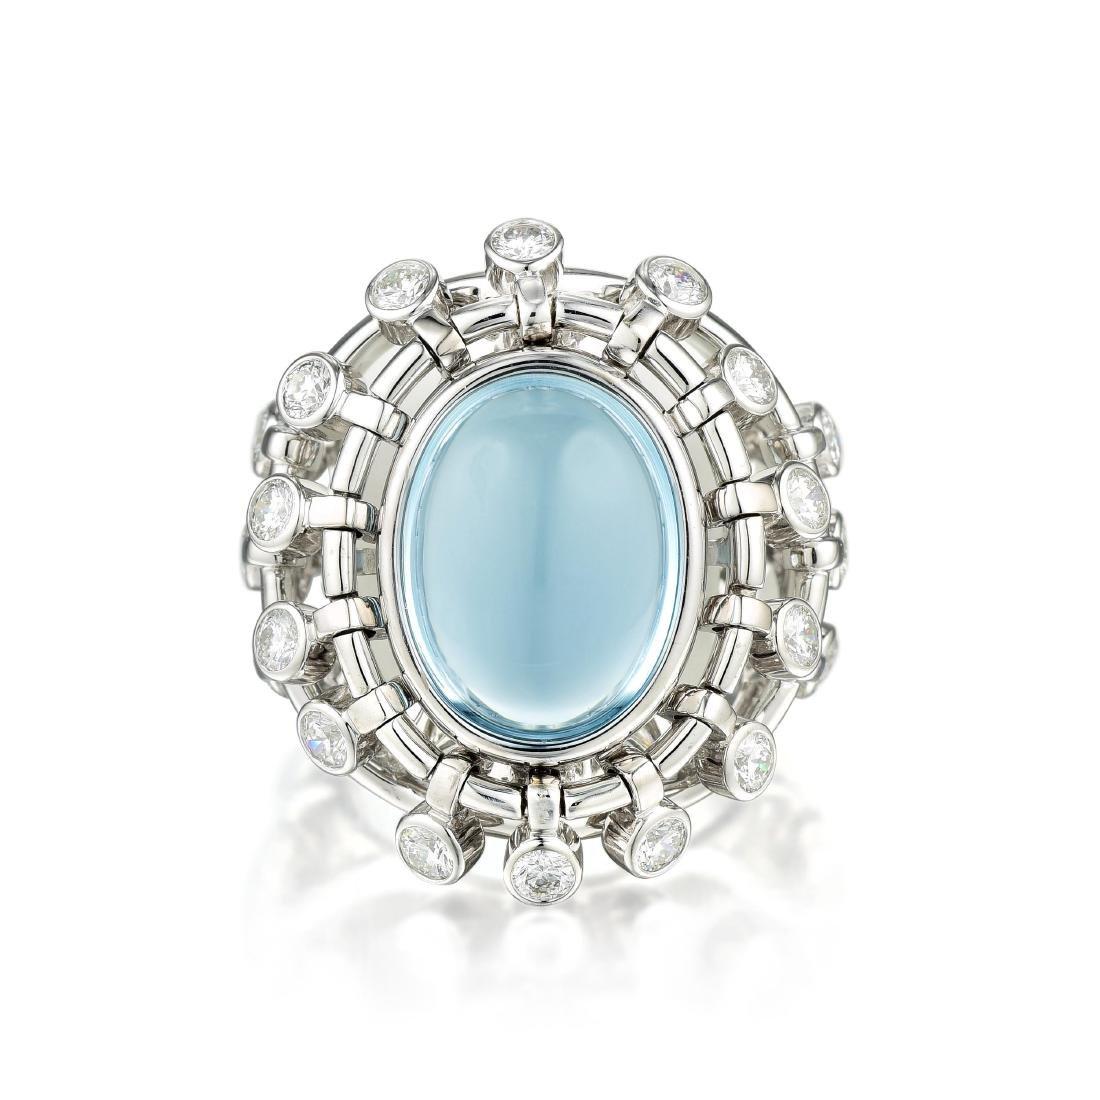 Christian Dior Sultane Aquamarine and Diamond Ring